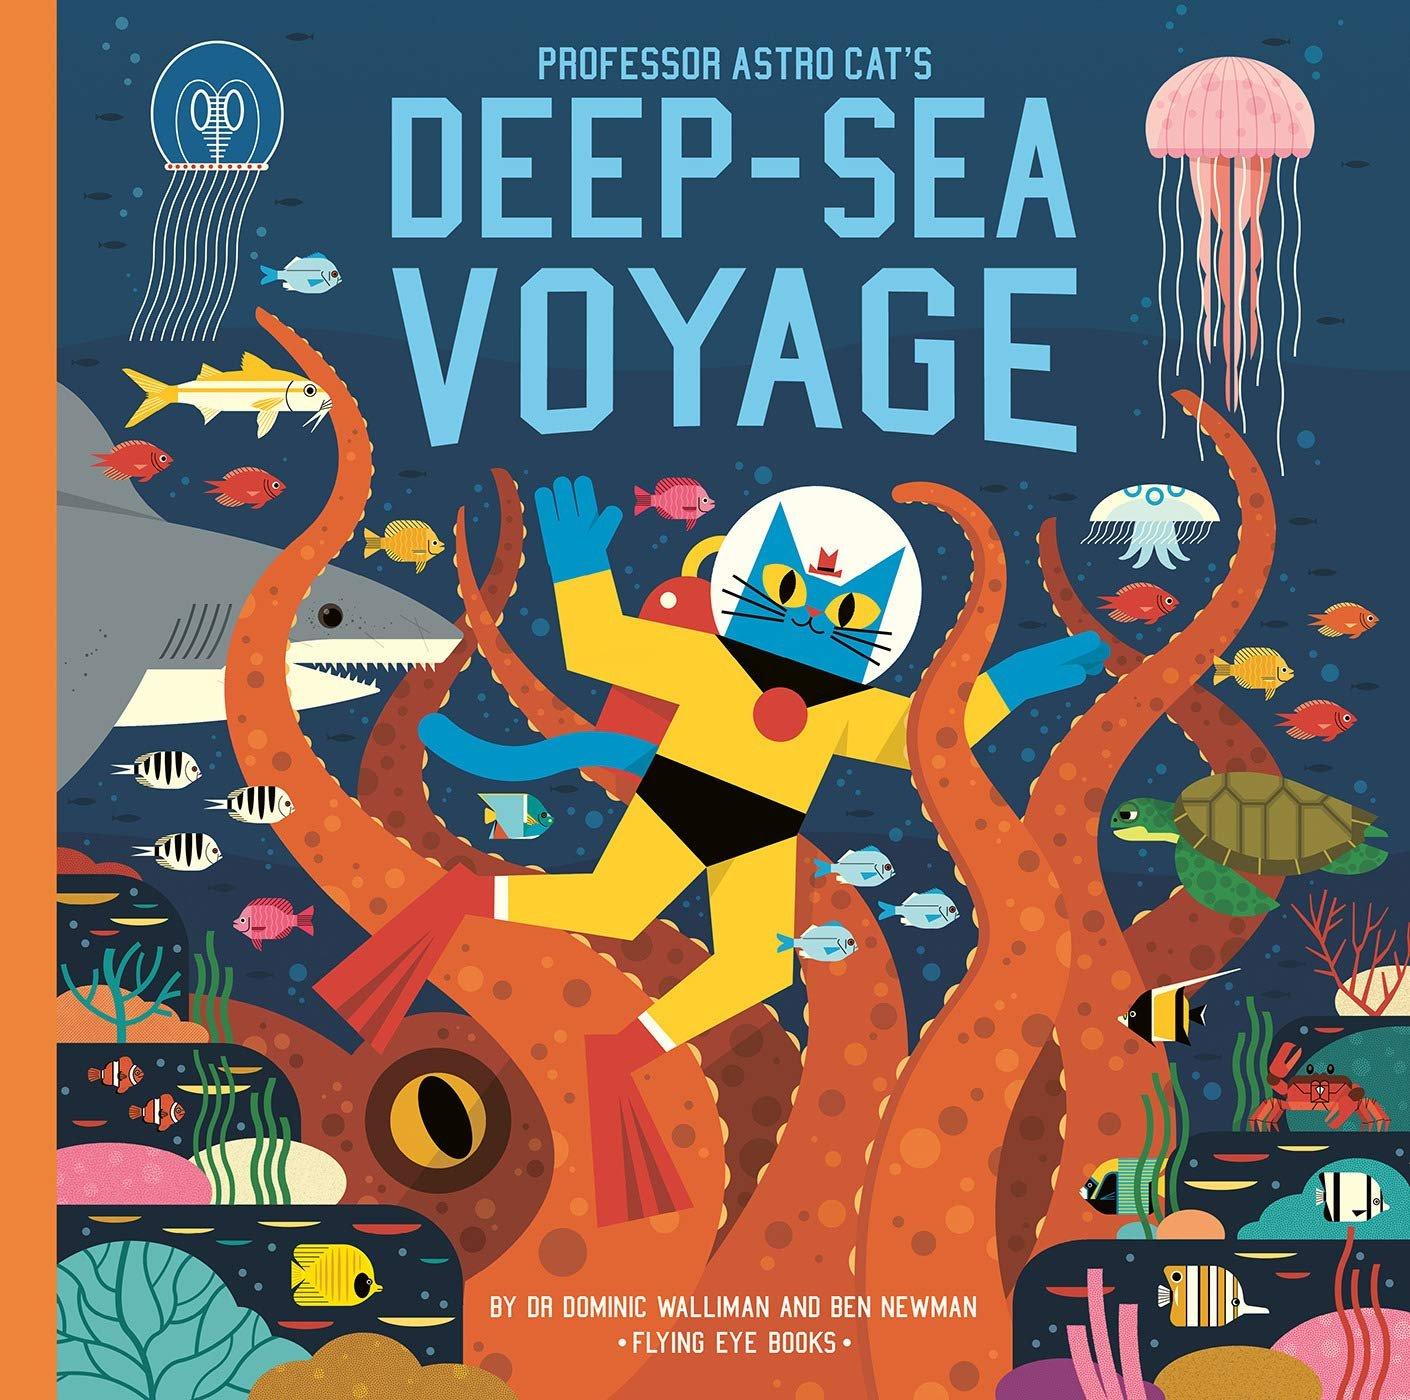 Professor Astro Cat's Deep-Sea Voyage by Dr. Dominic Walliman